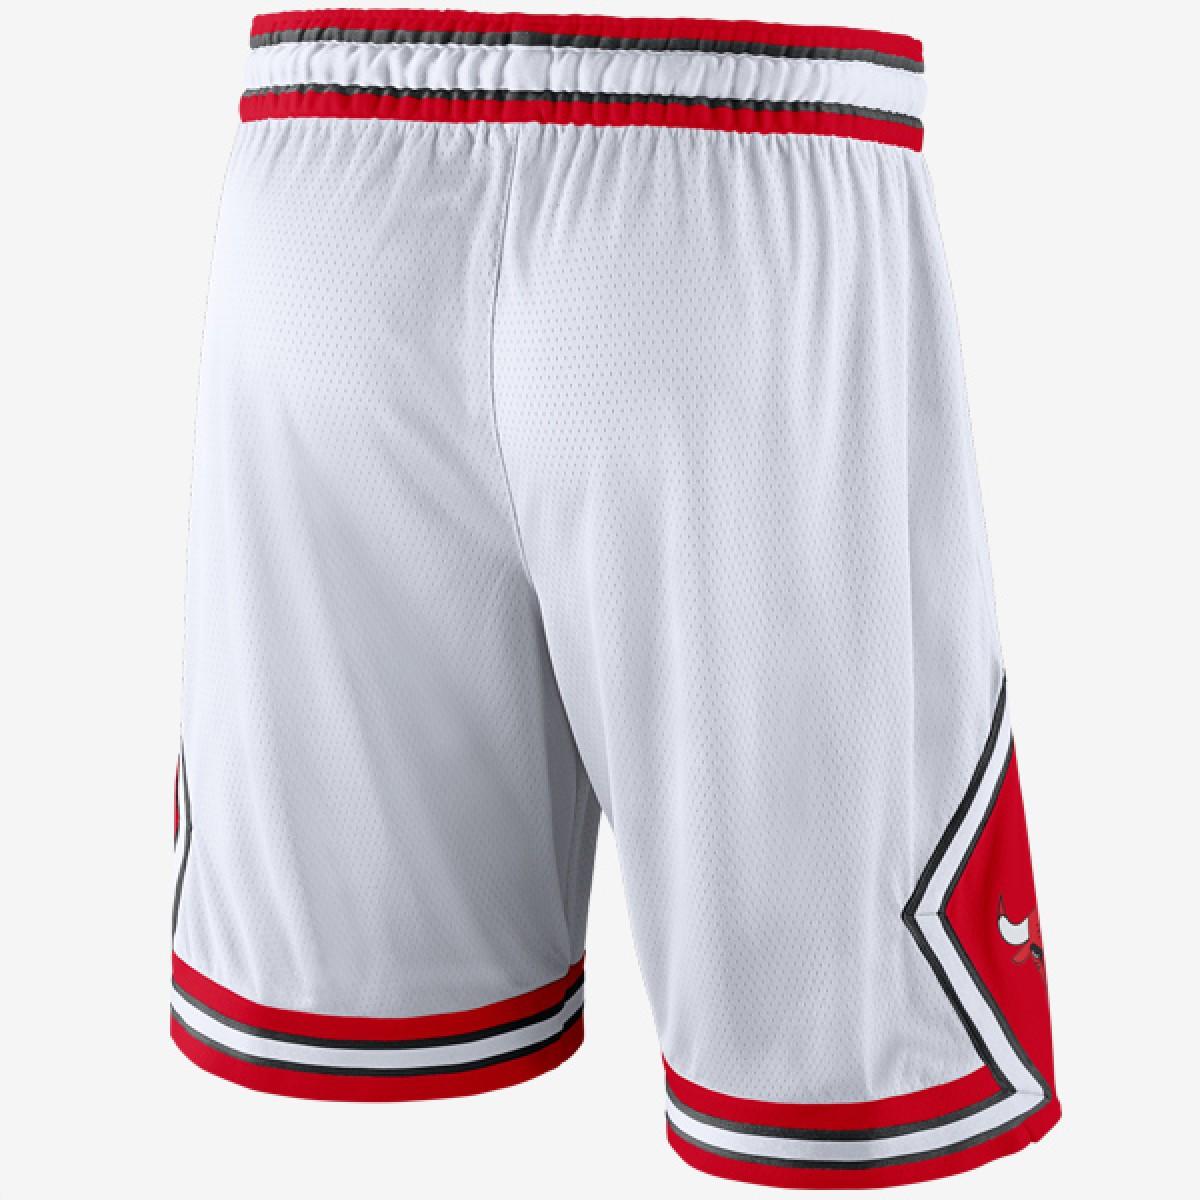 Nike NBA Bulls Swingman Short 'Association Edition' 866787-100